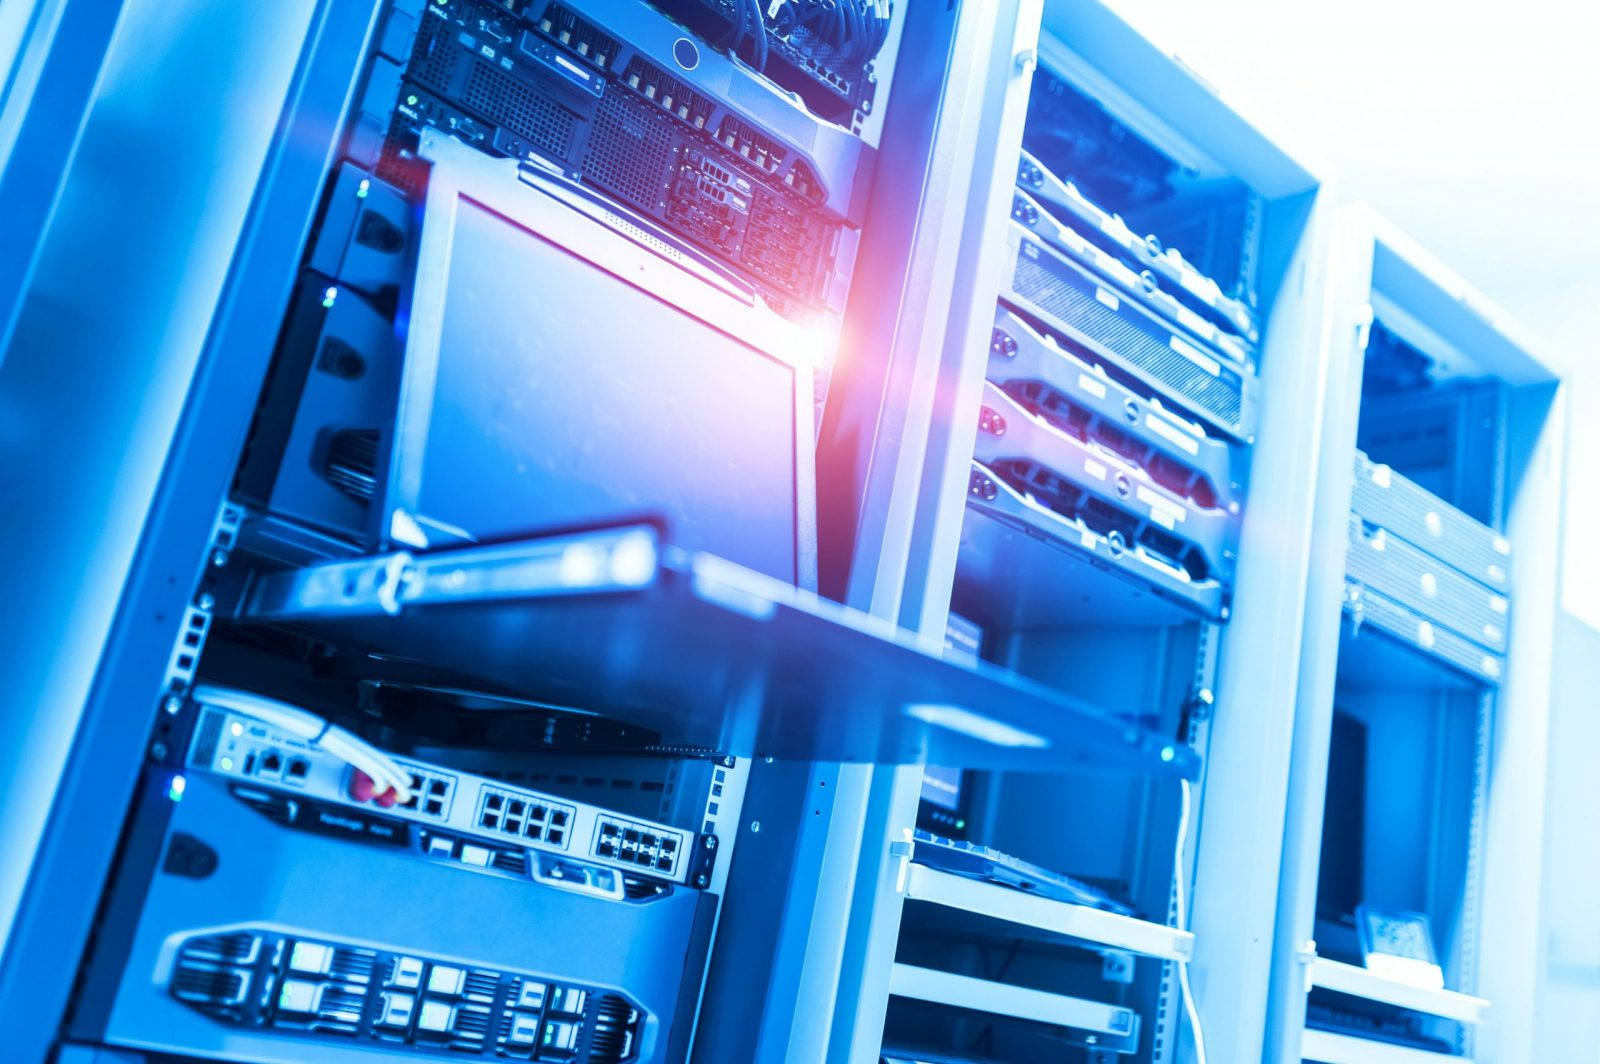 API Integration into Property Management System